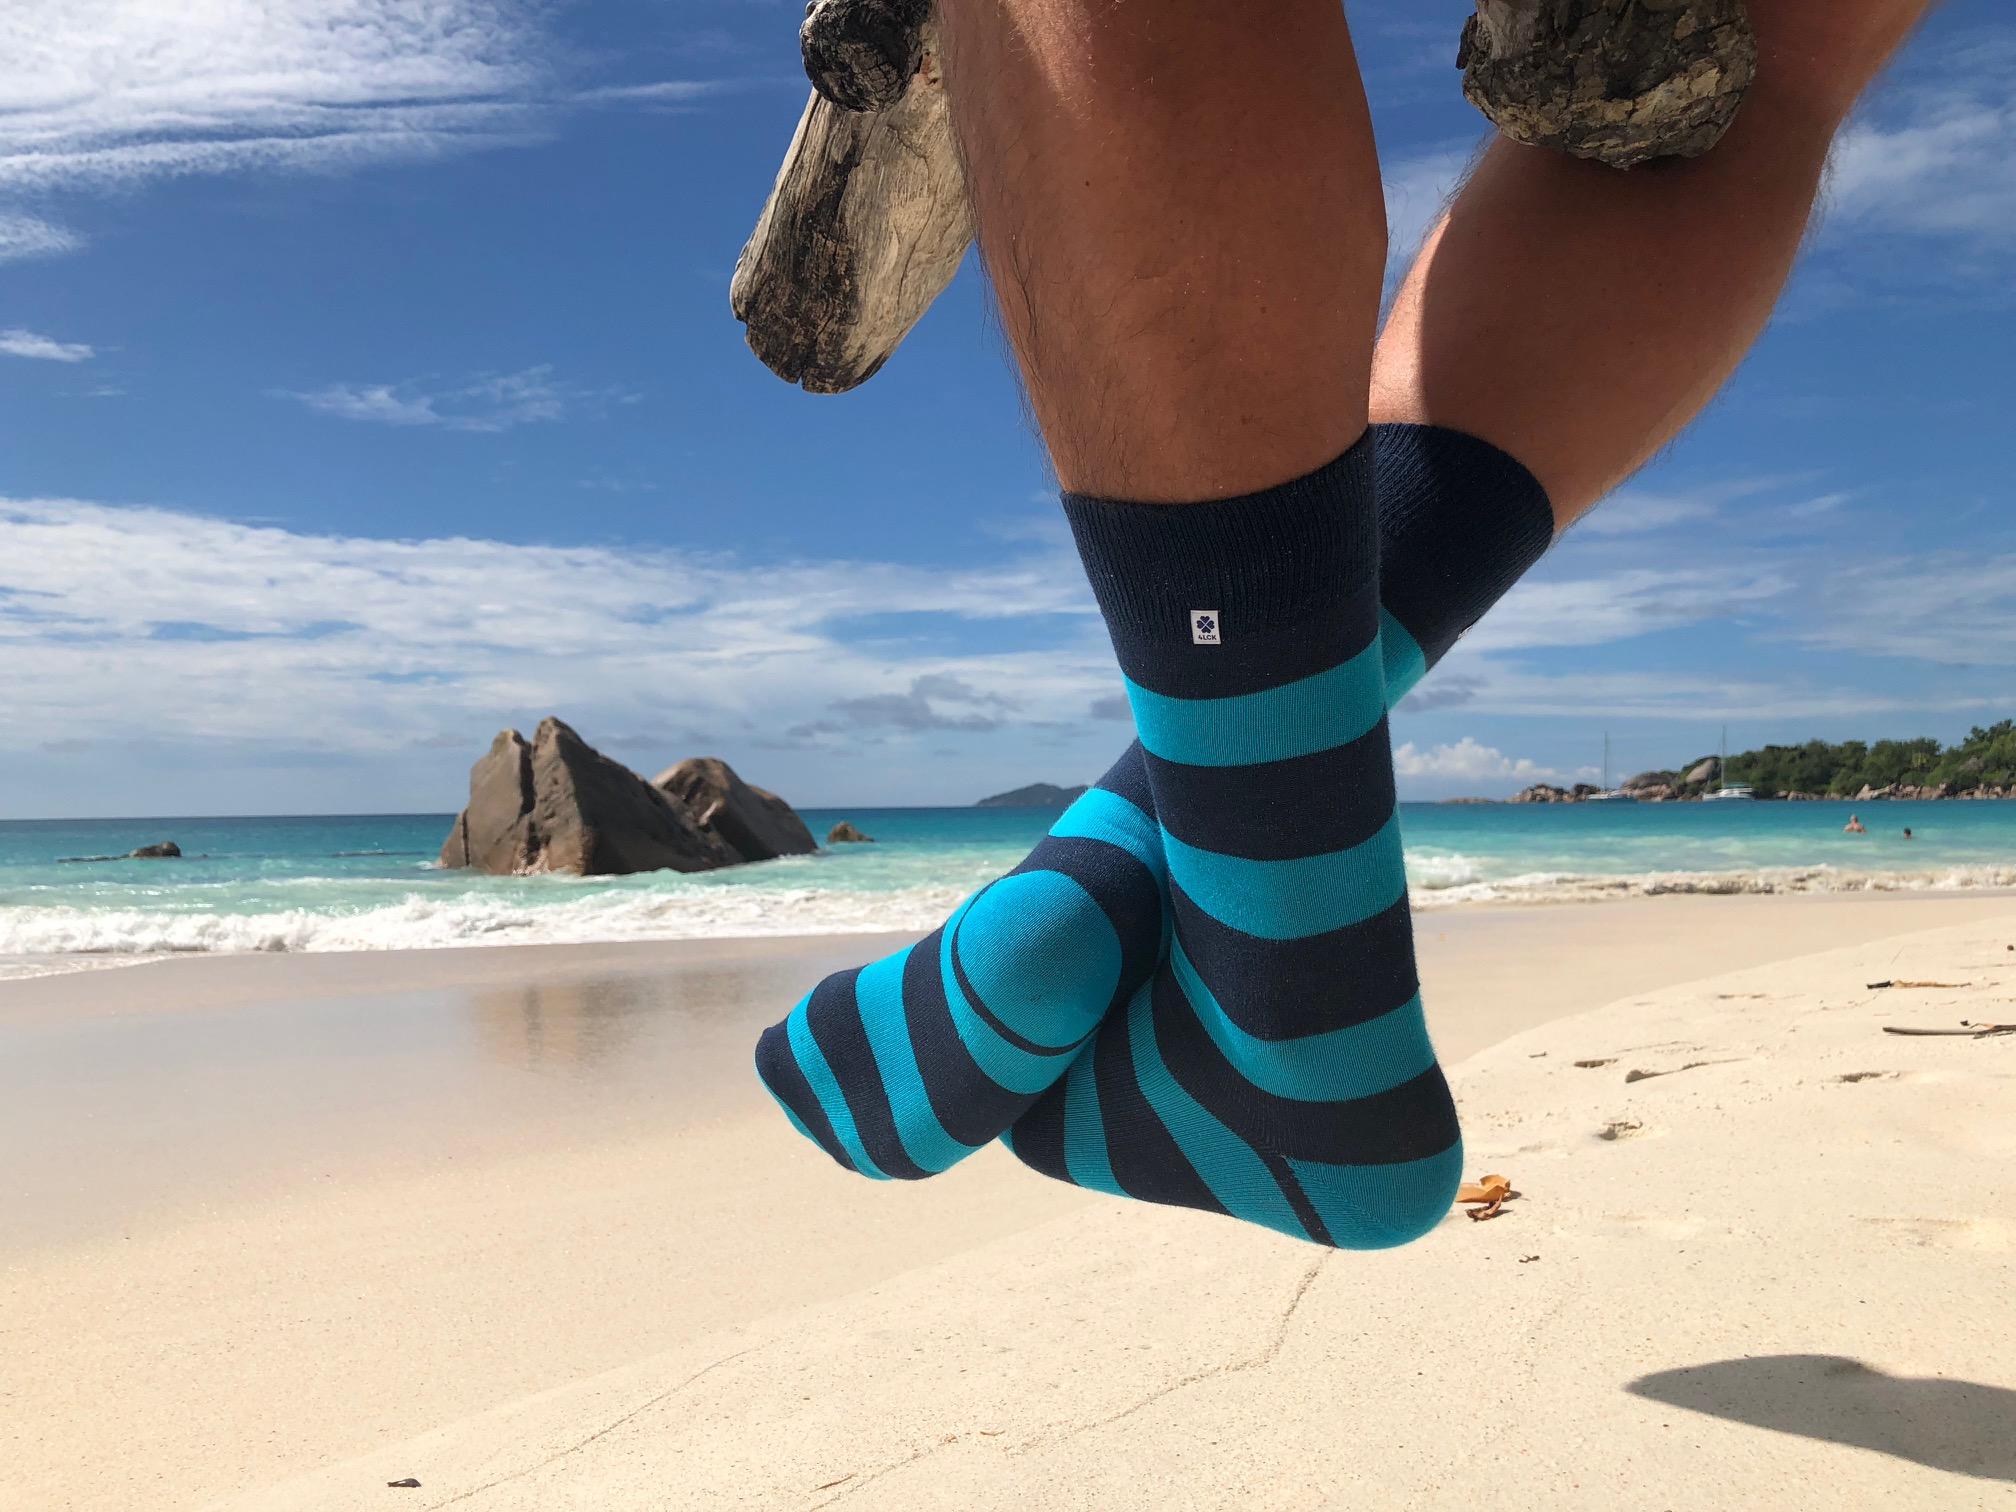 4lck Blue stripes socks - Praslin, Seychelles